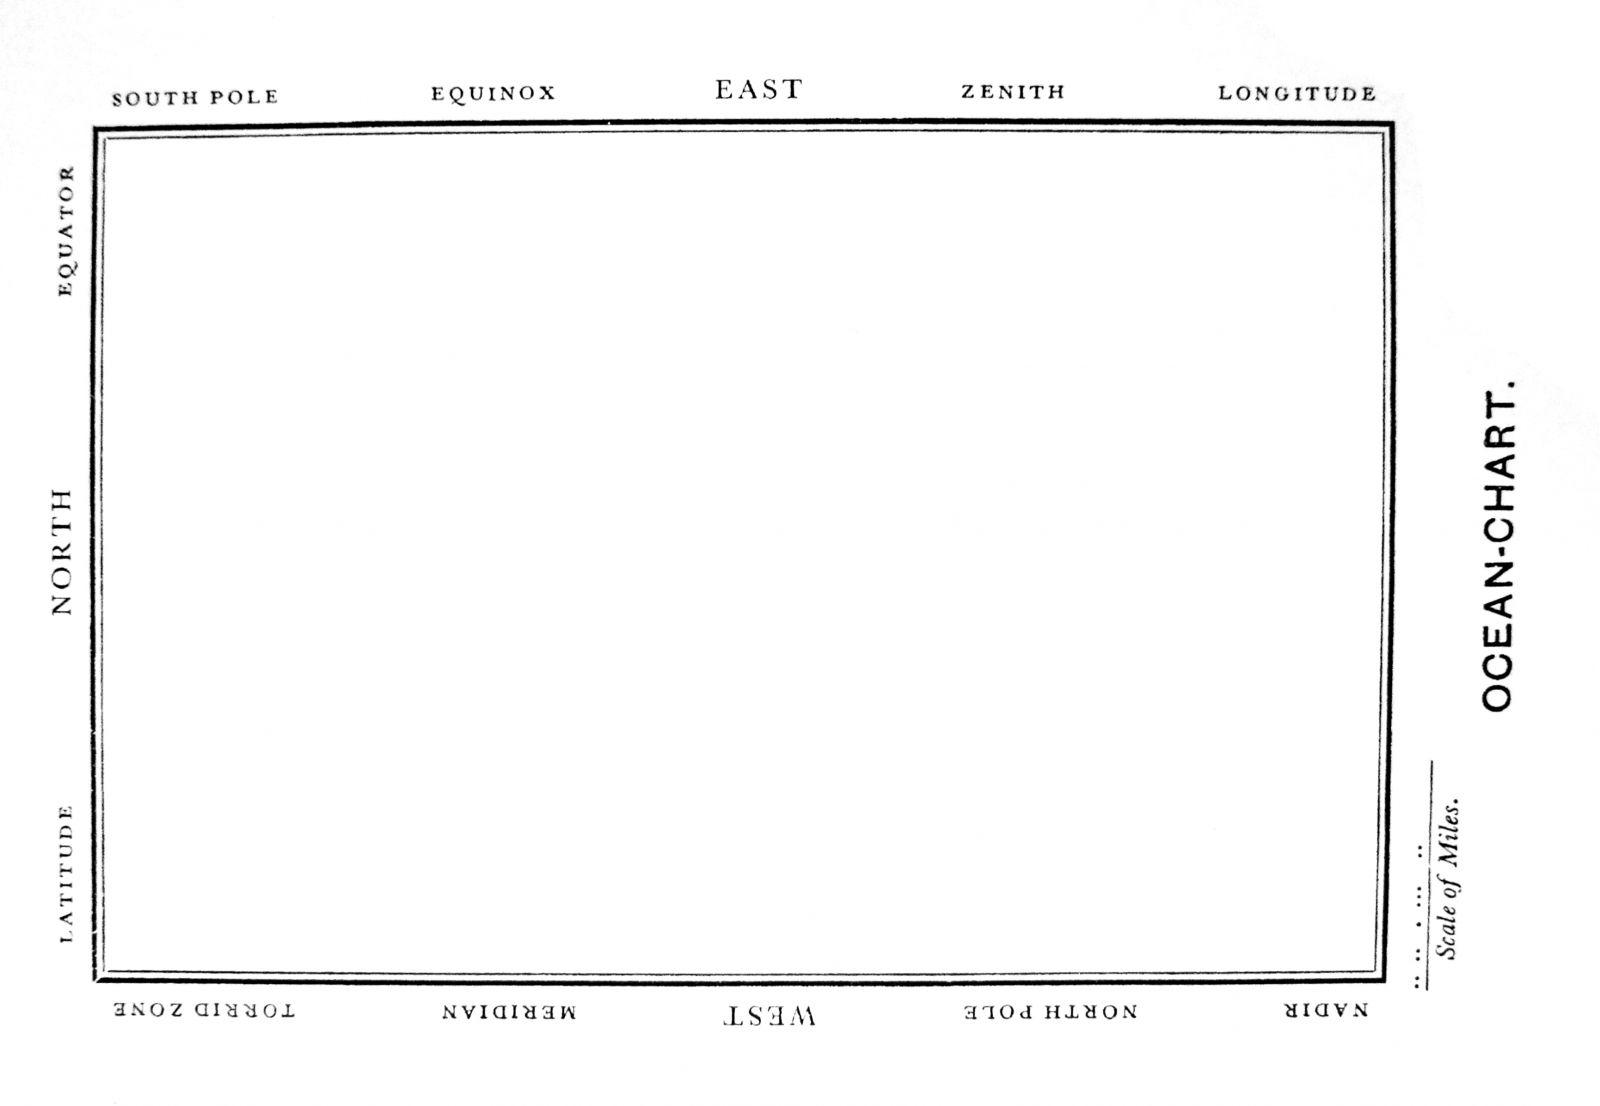 lewis-carroll-ocean-chart_ok-d0d87fdd0bc922179363393c89377dc1